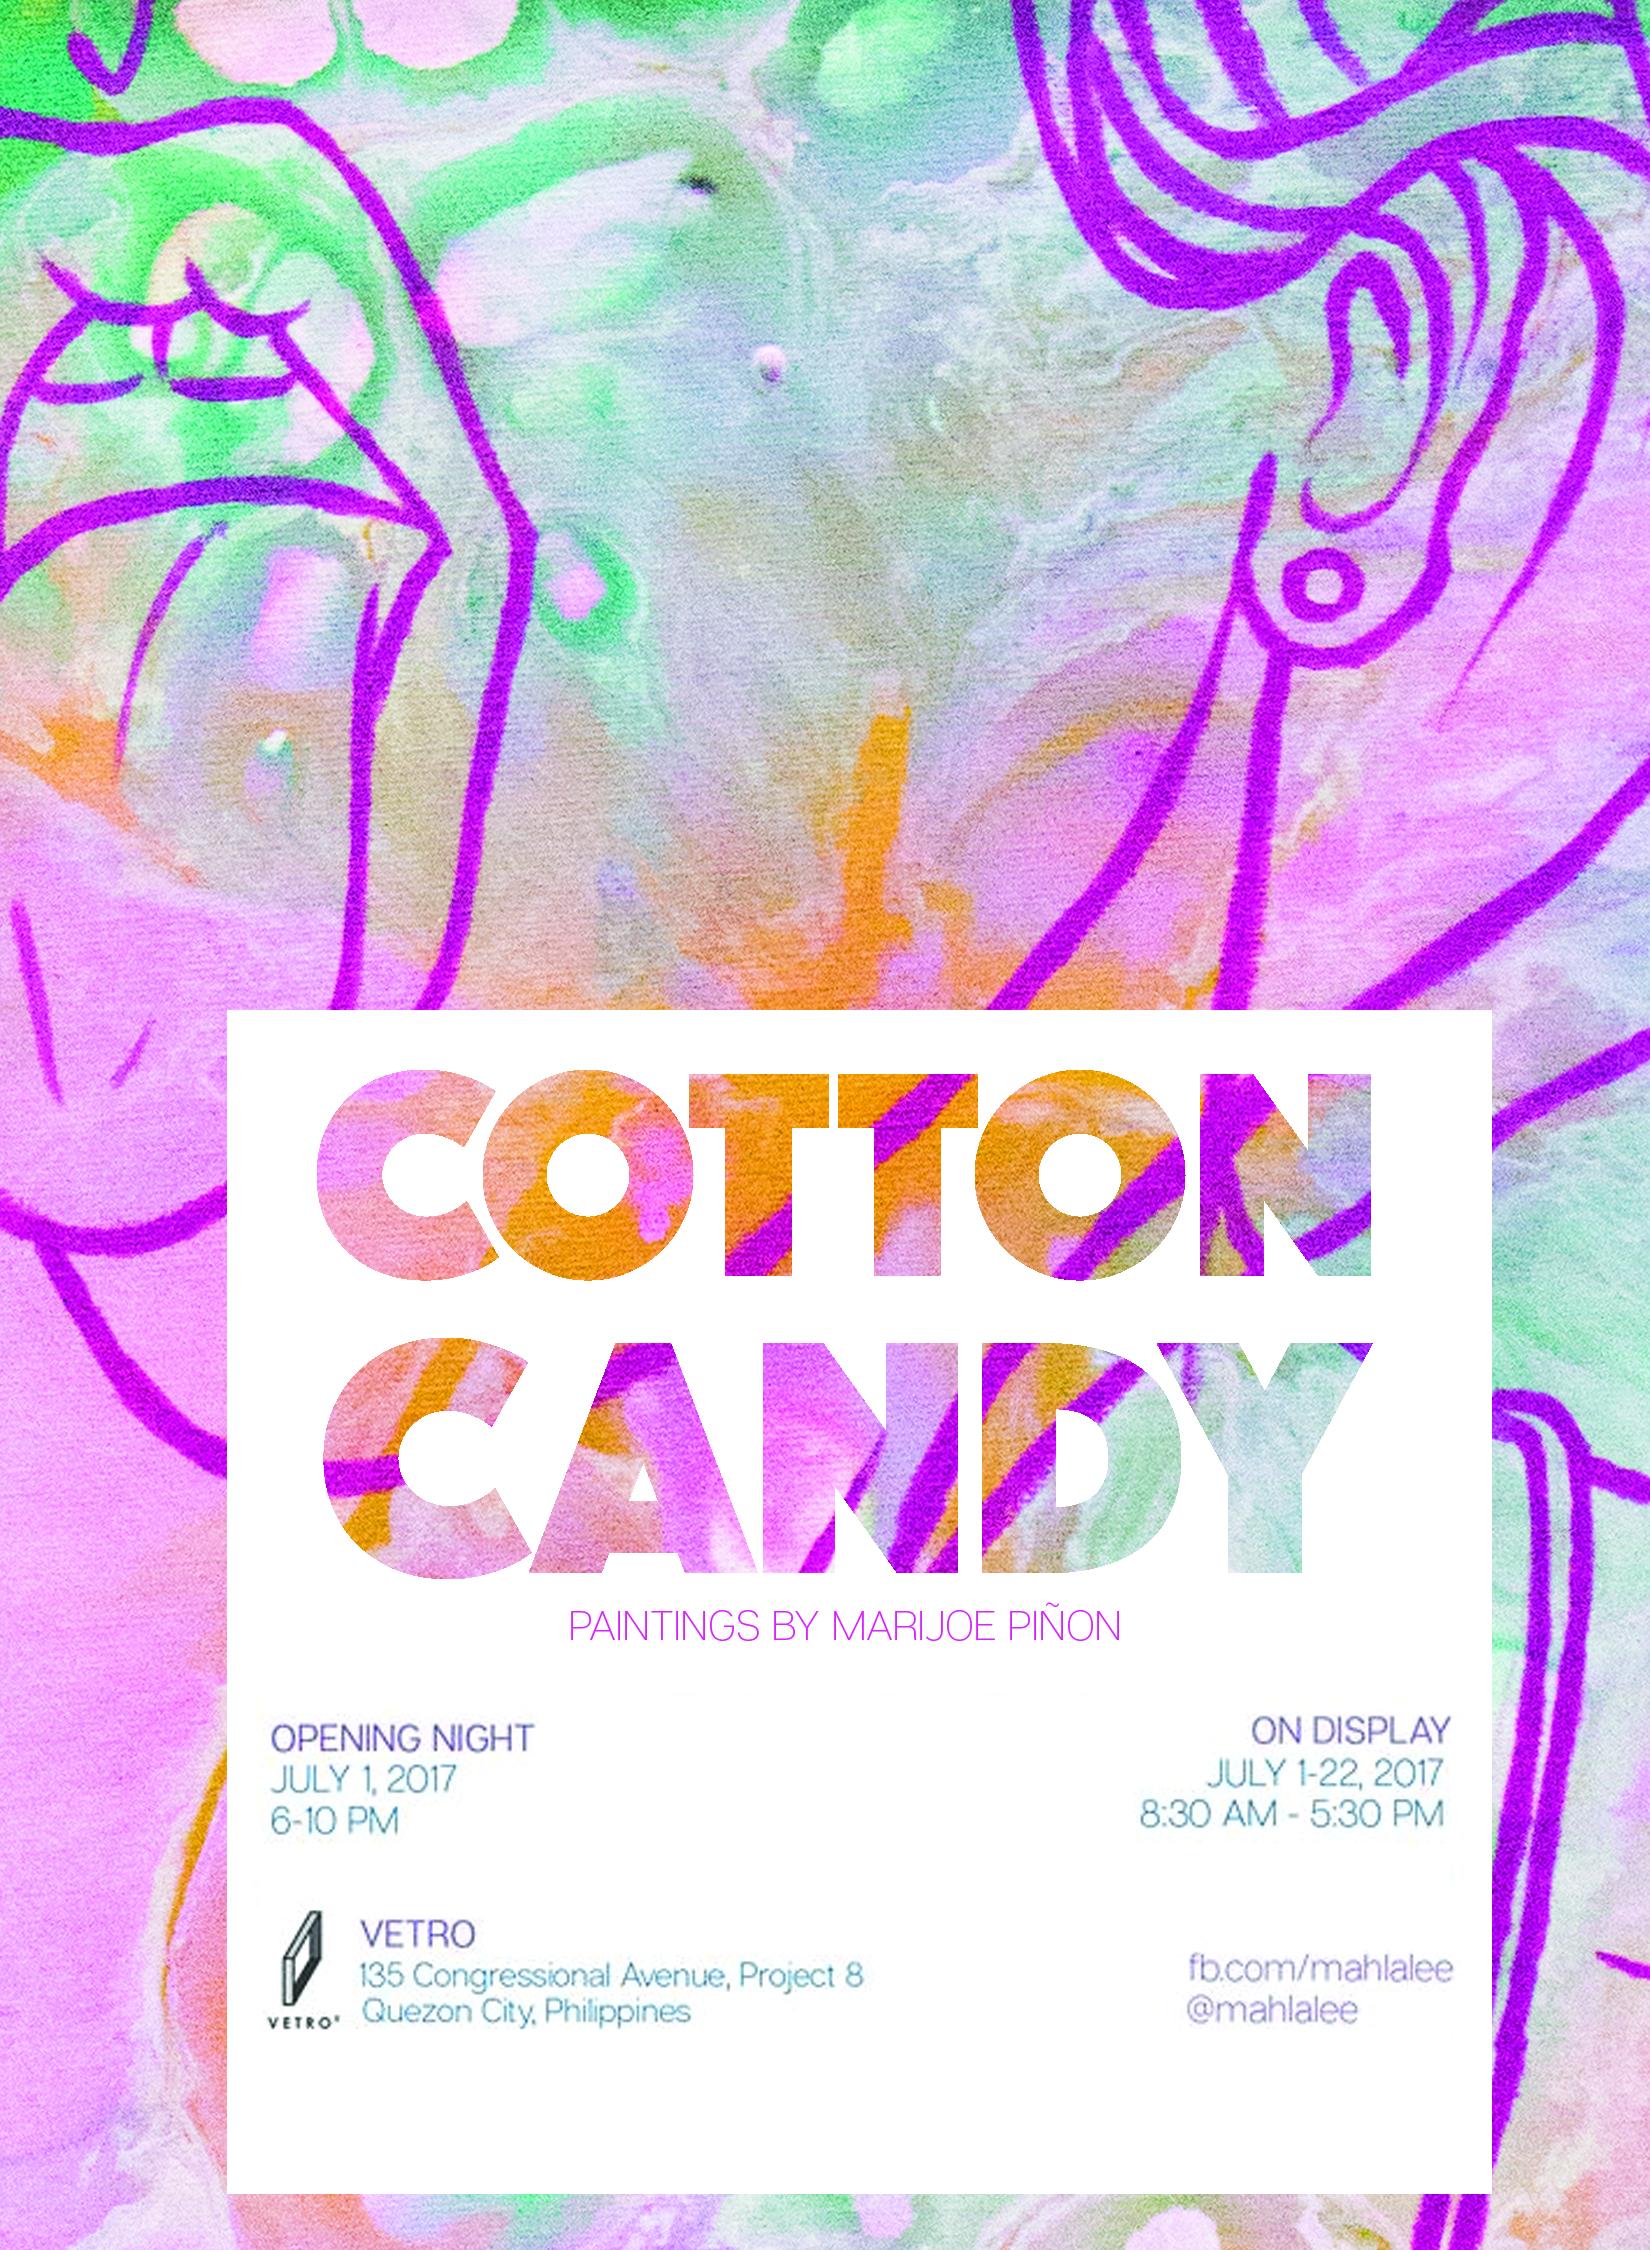 vetro_2017_cotton candy